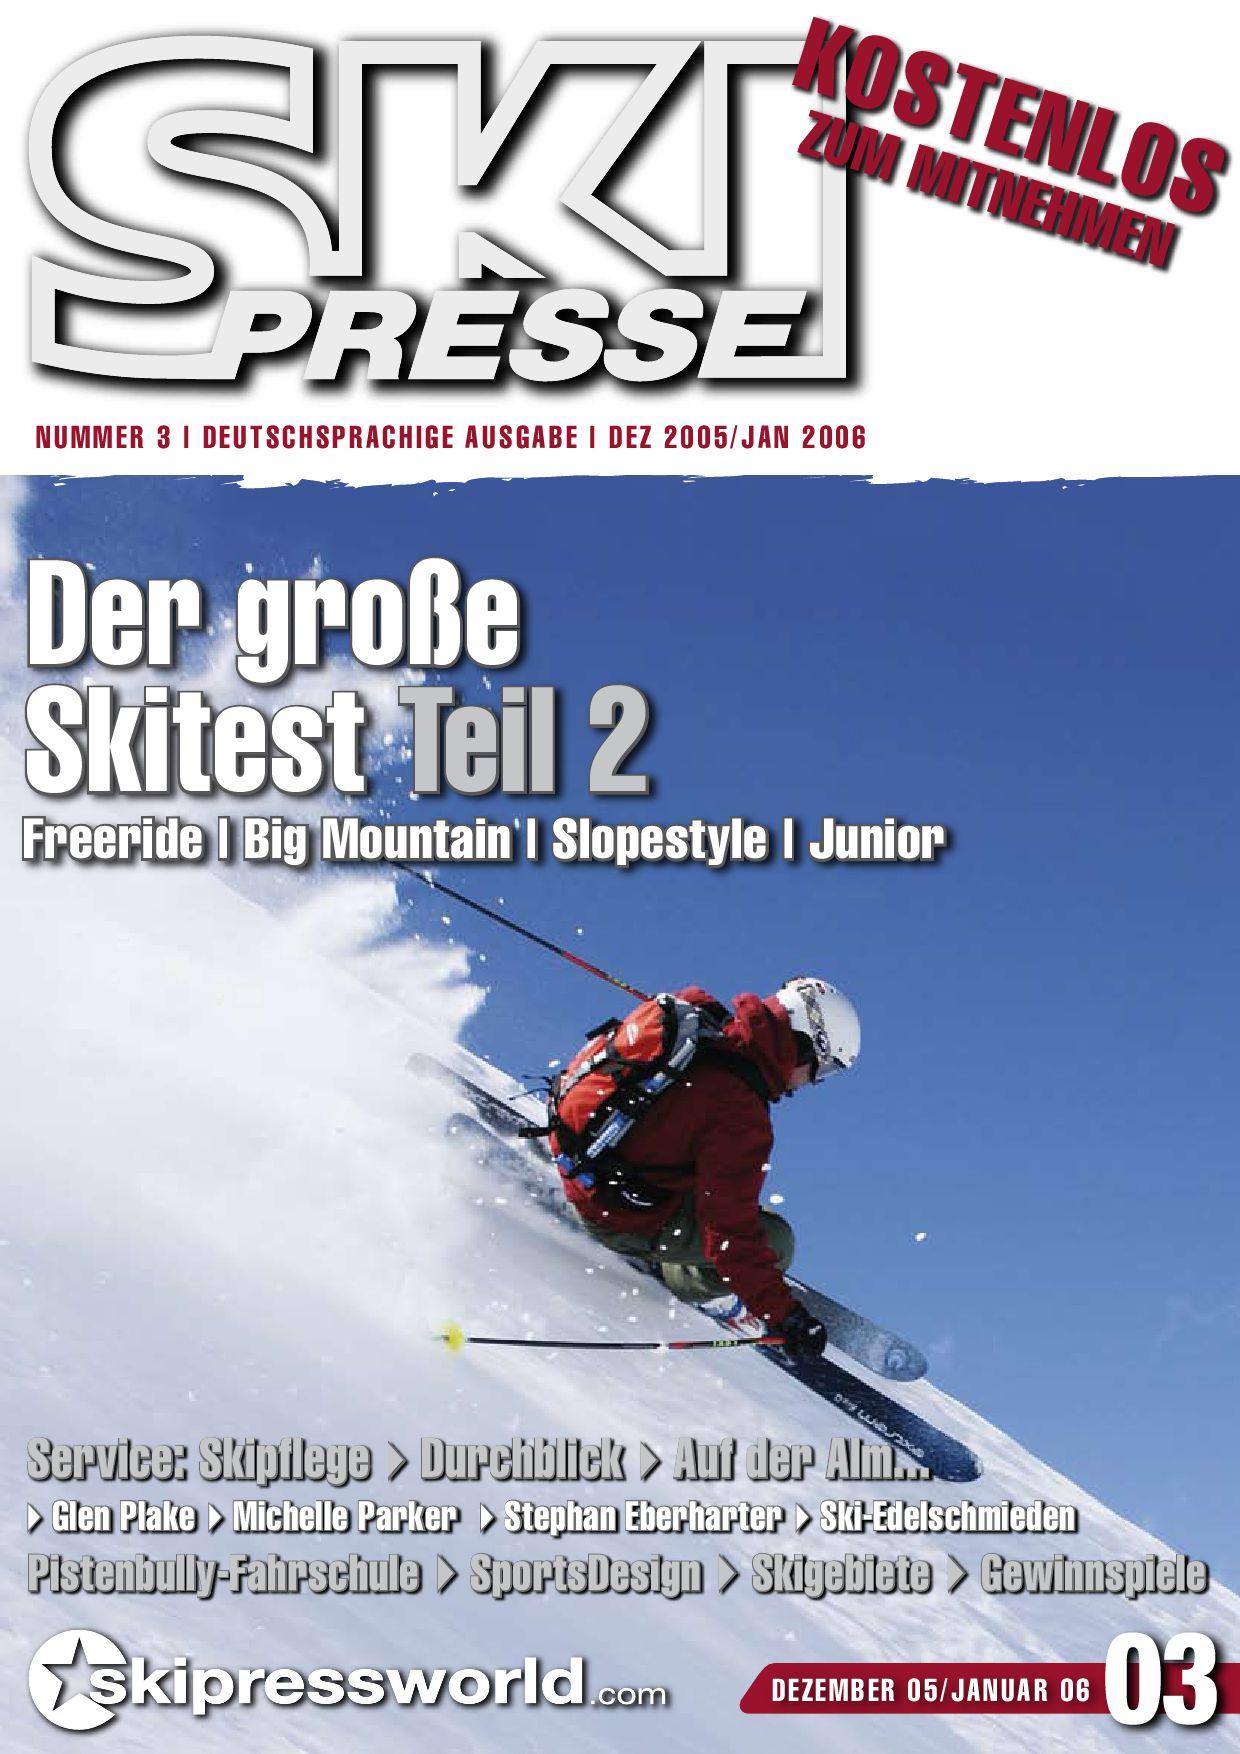 SkiPresse Nr. 3 by die denkbar Wolfgang Greiner issuu